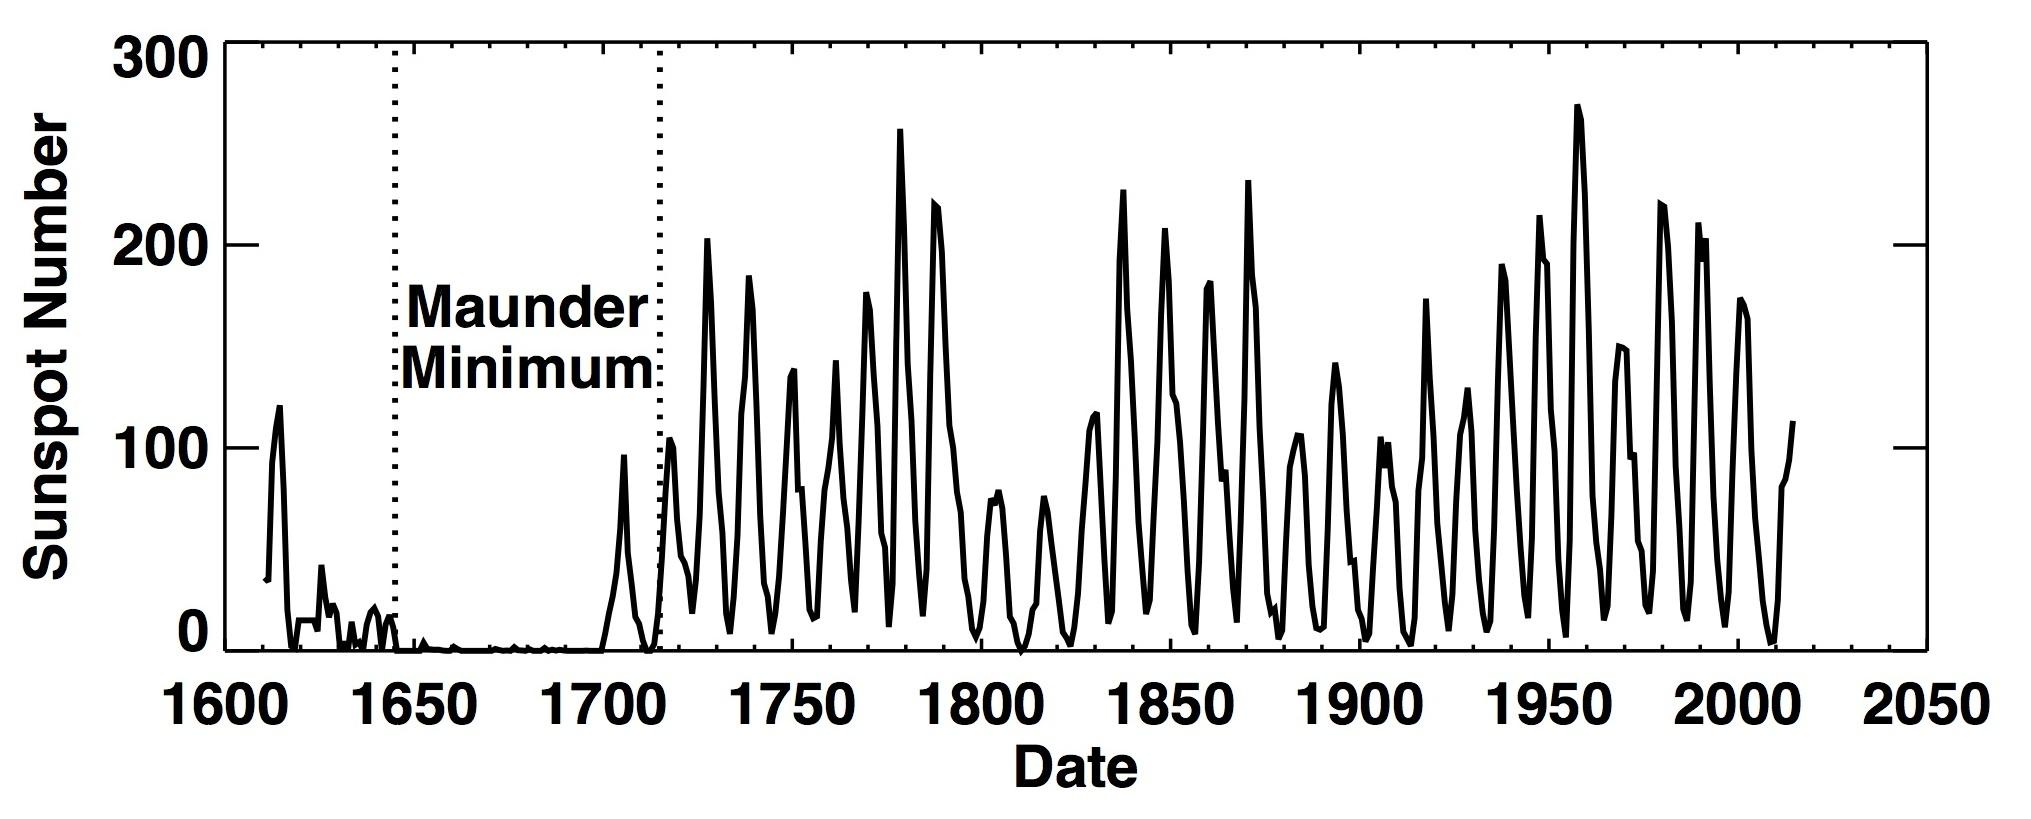 Maunder Minimum sunspot data